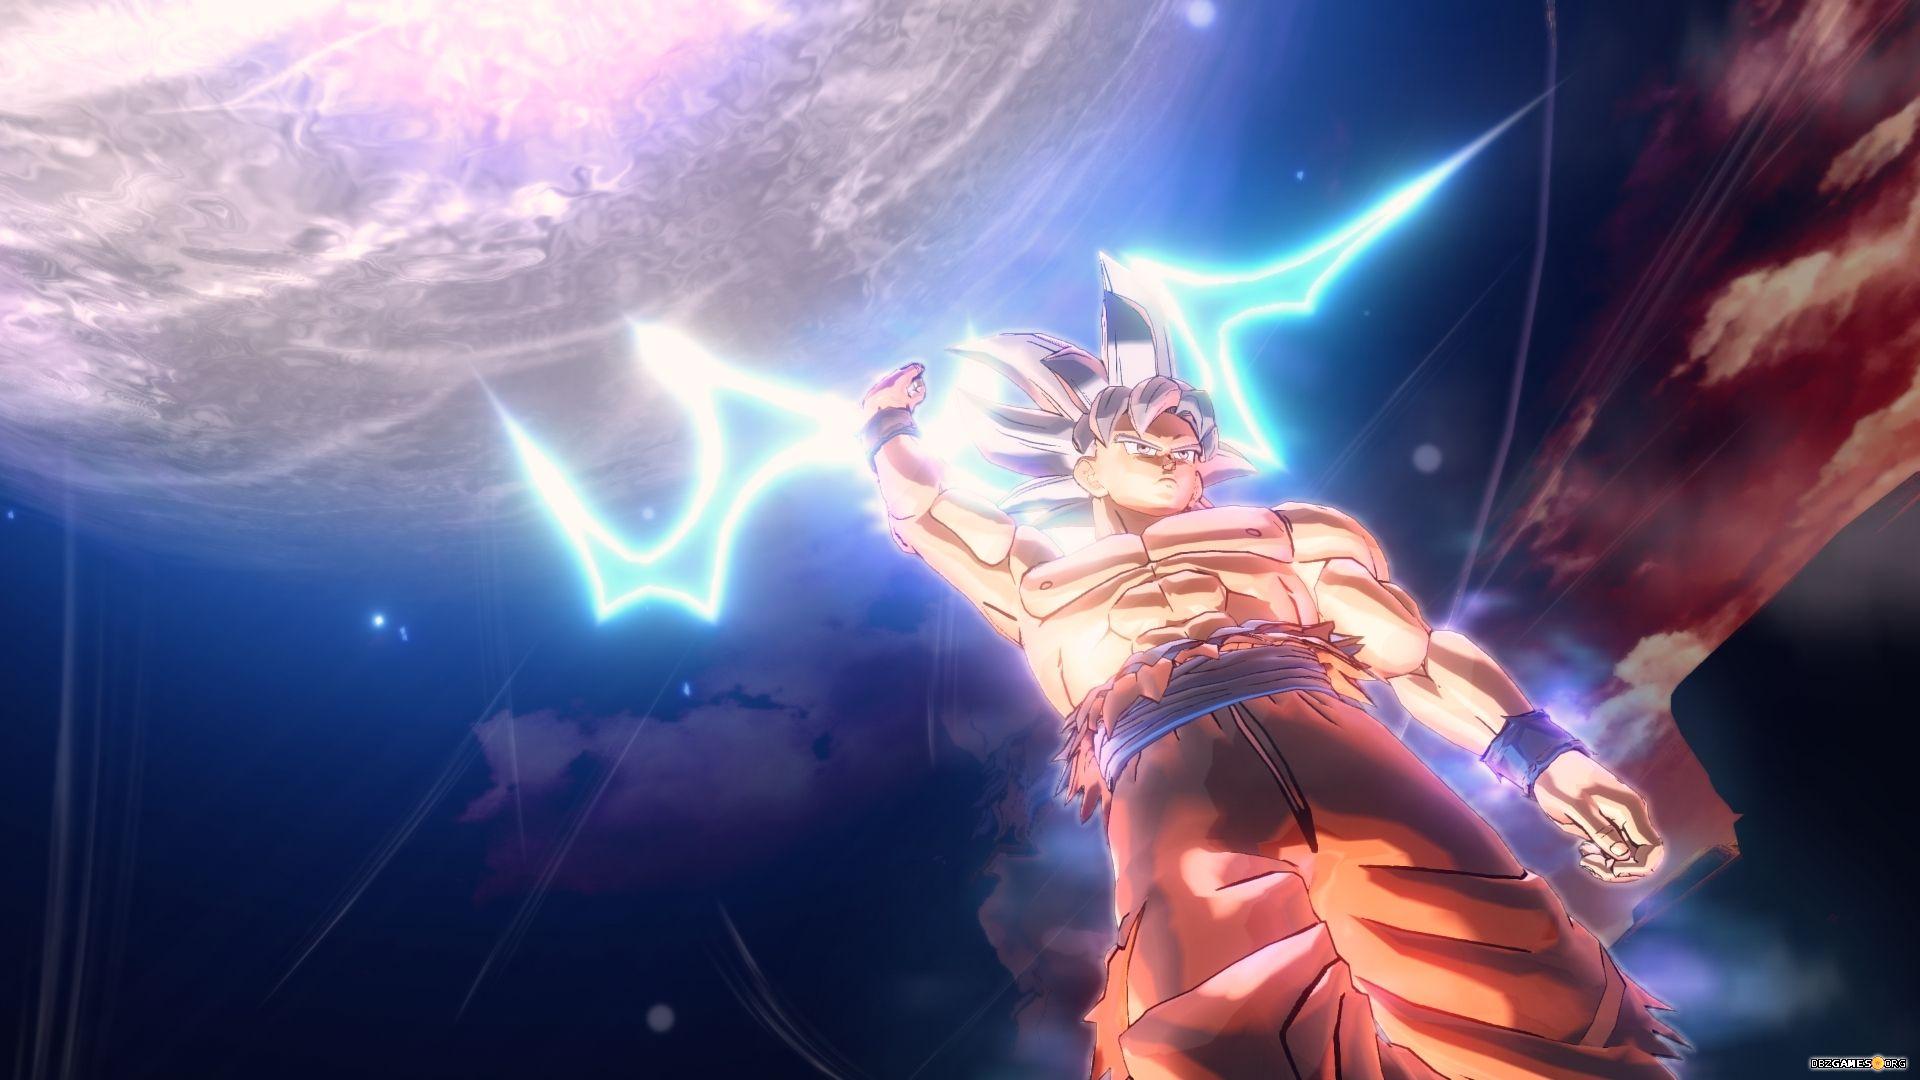 dragon ball xenoverse 2: goku ultra instinct and extra story